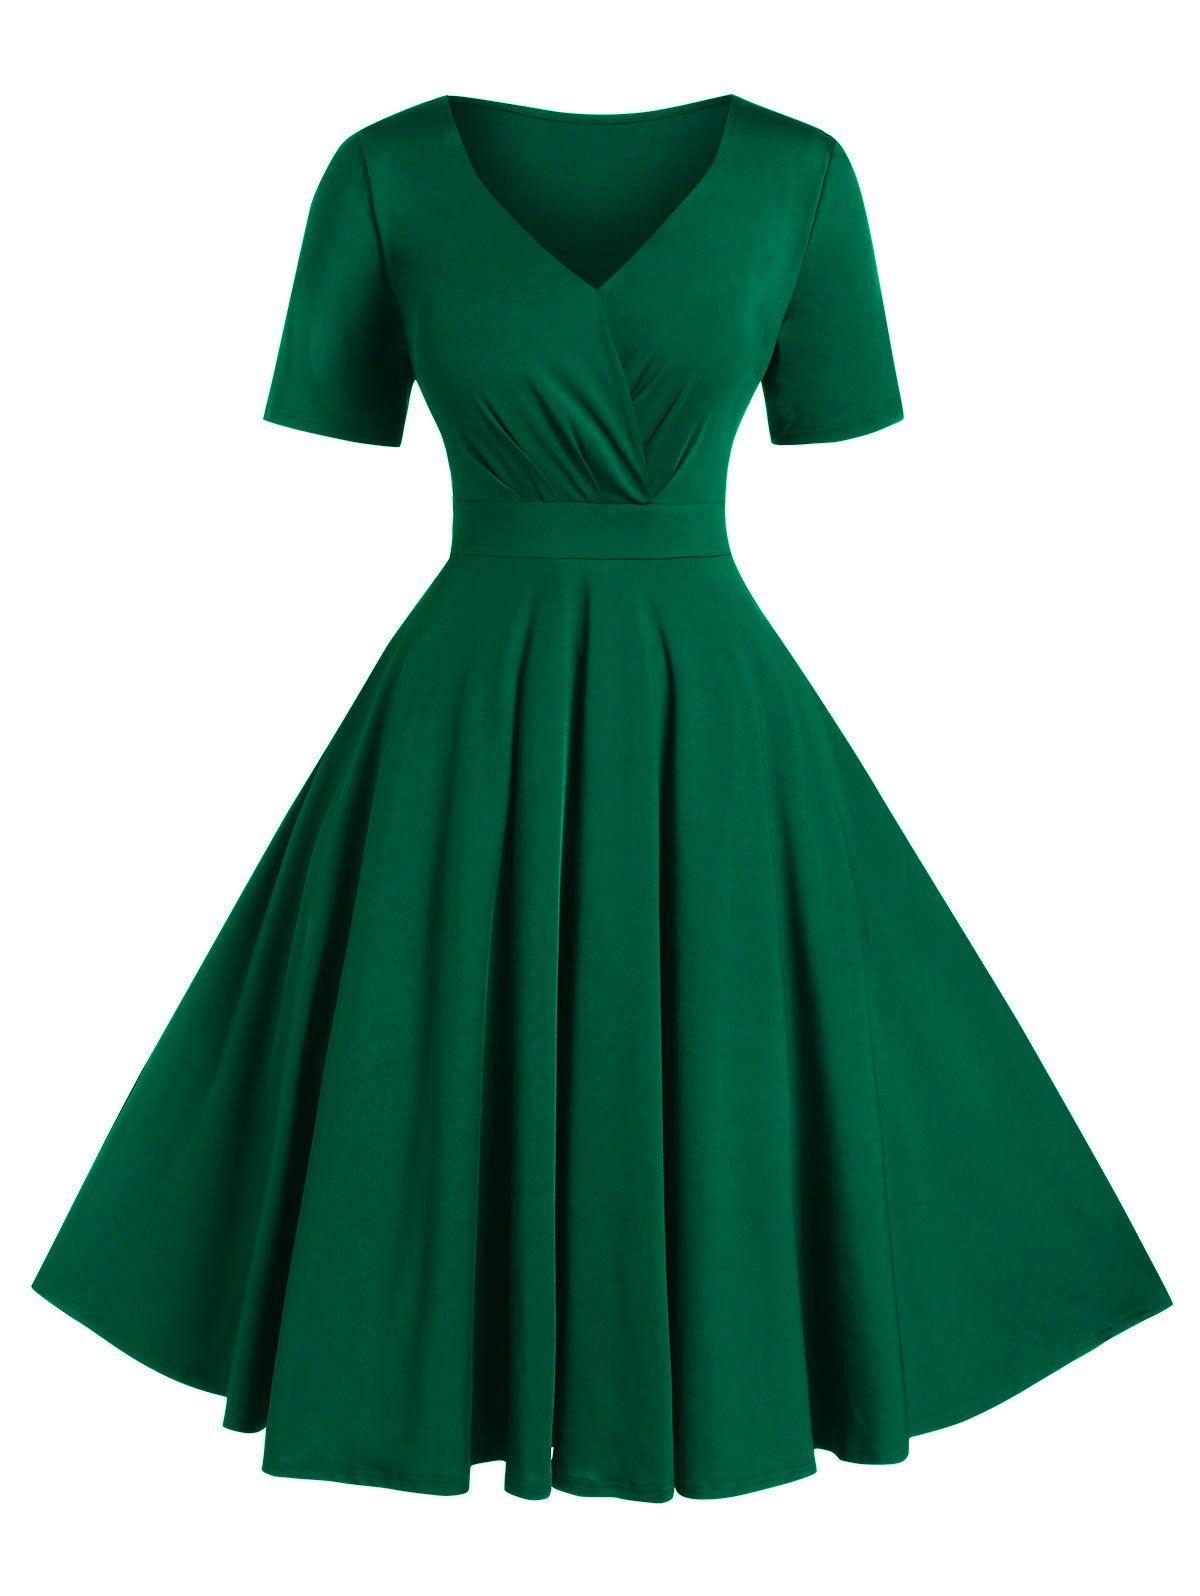 Plus Size A Line Solid V Neck Vintage Dress Affiliate Solid Line Size Dres Dresses For Apple Shape Cowgirl Outfits For Women Dresses Vintage Dresses